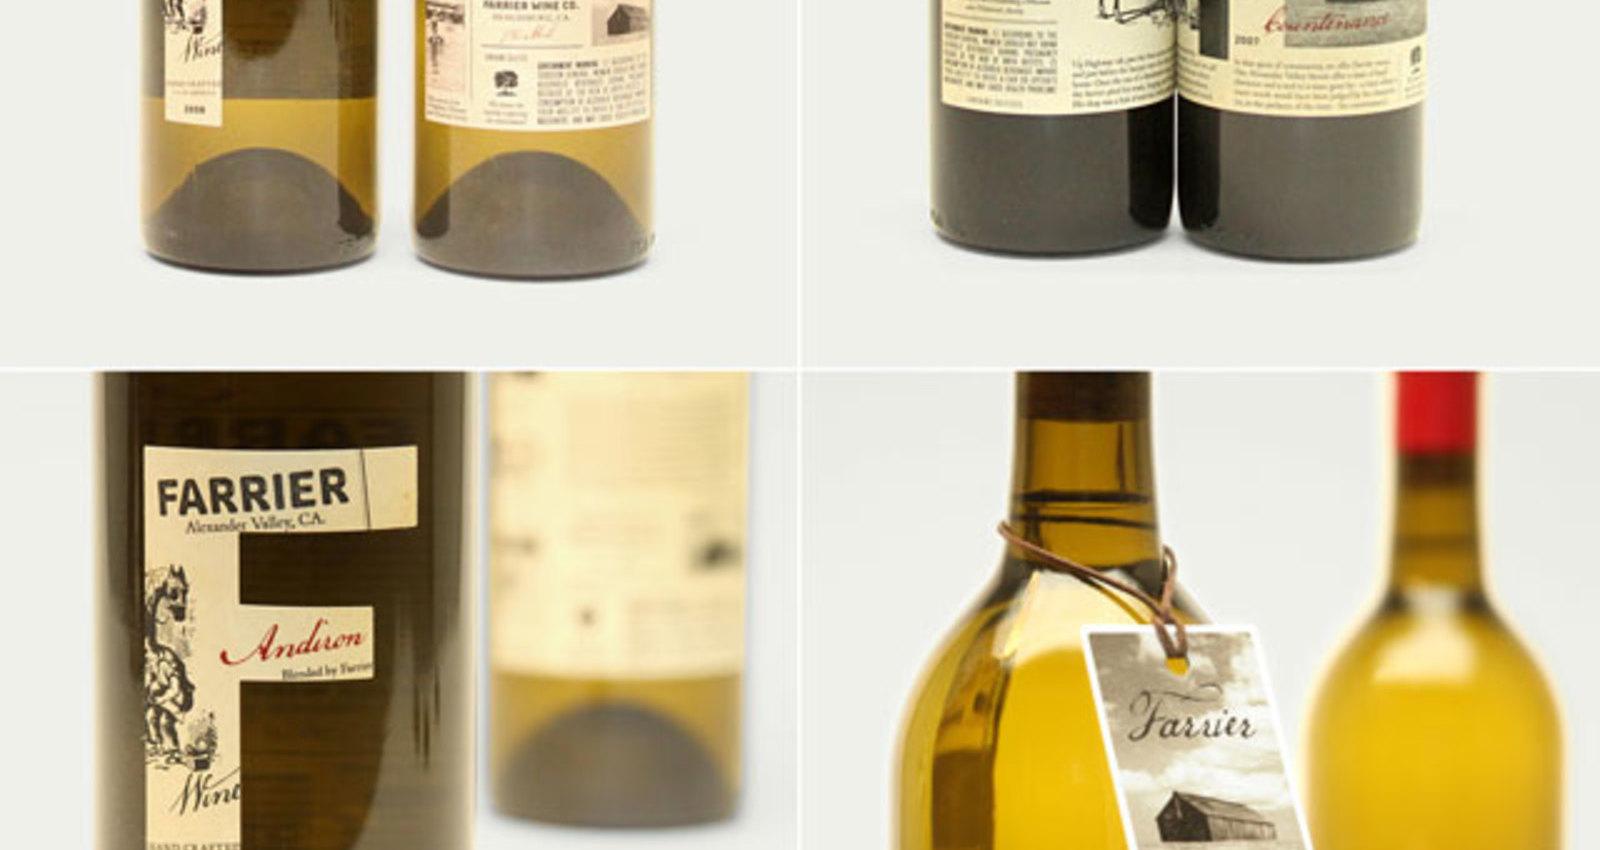 Farrier Wines Packaging